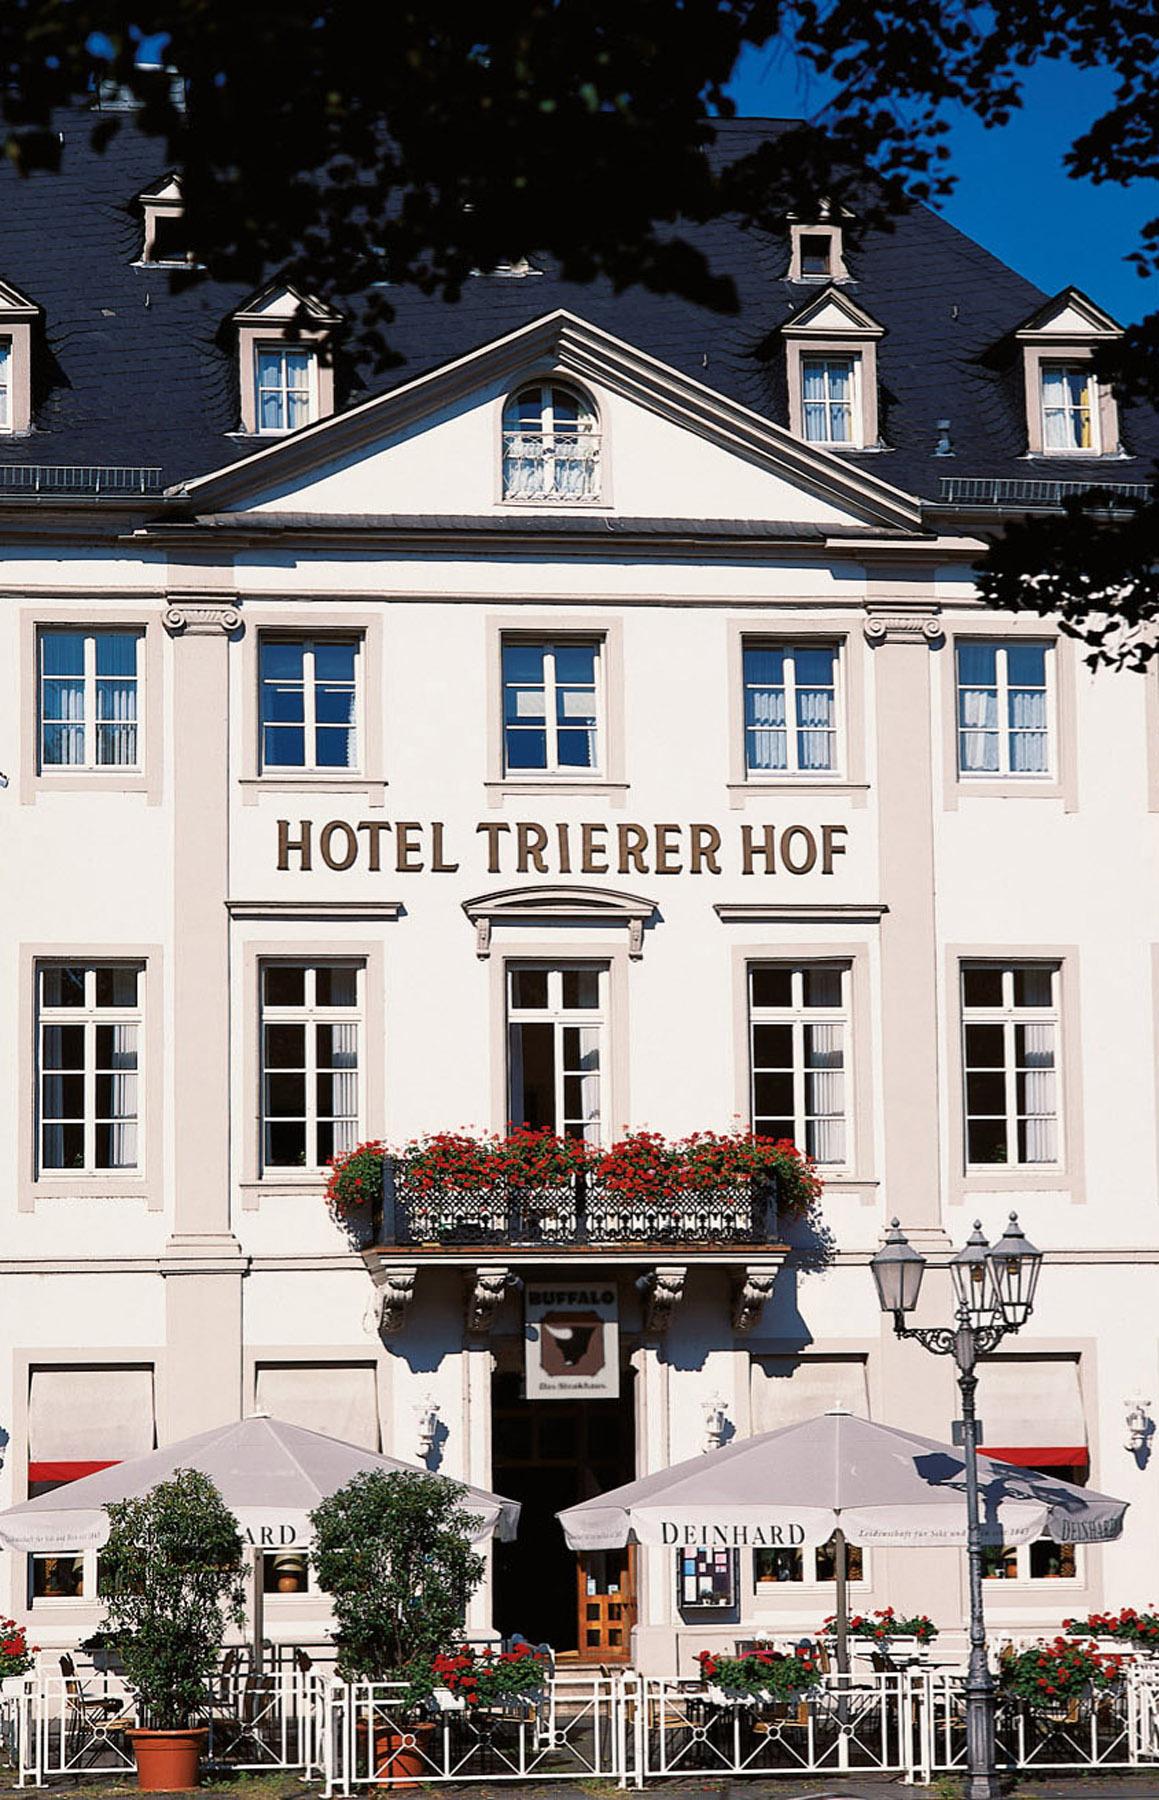 Hotel-Koblenz-Triererhof_22B4